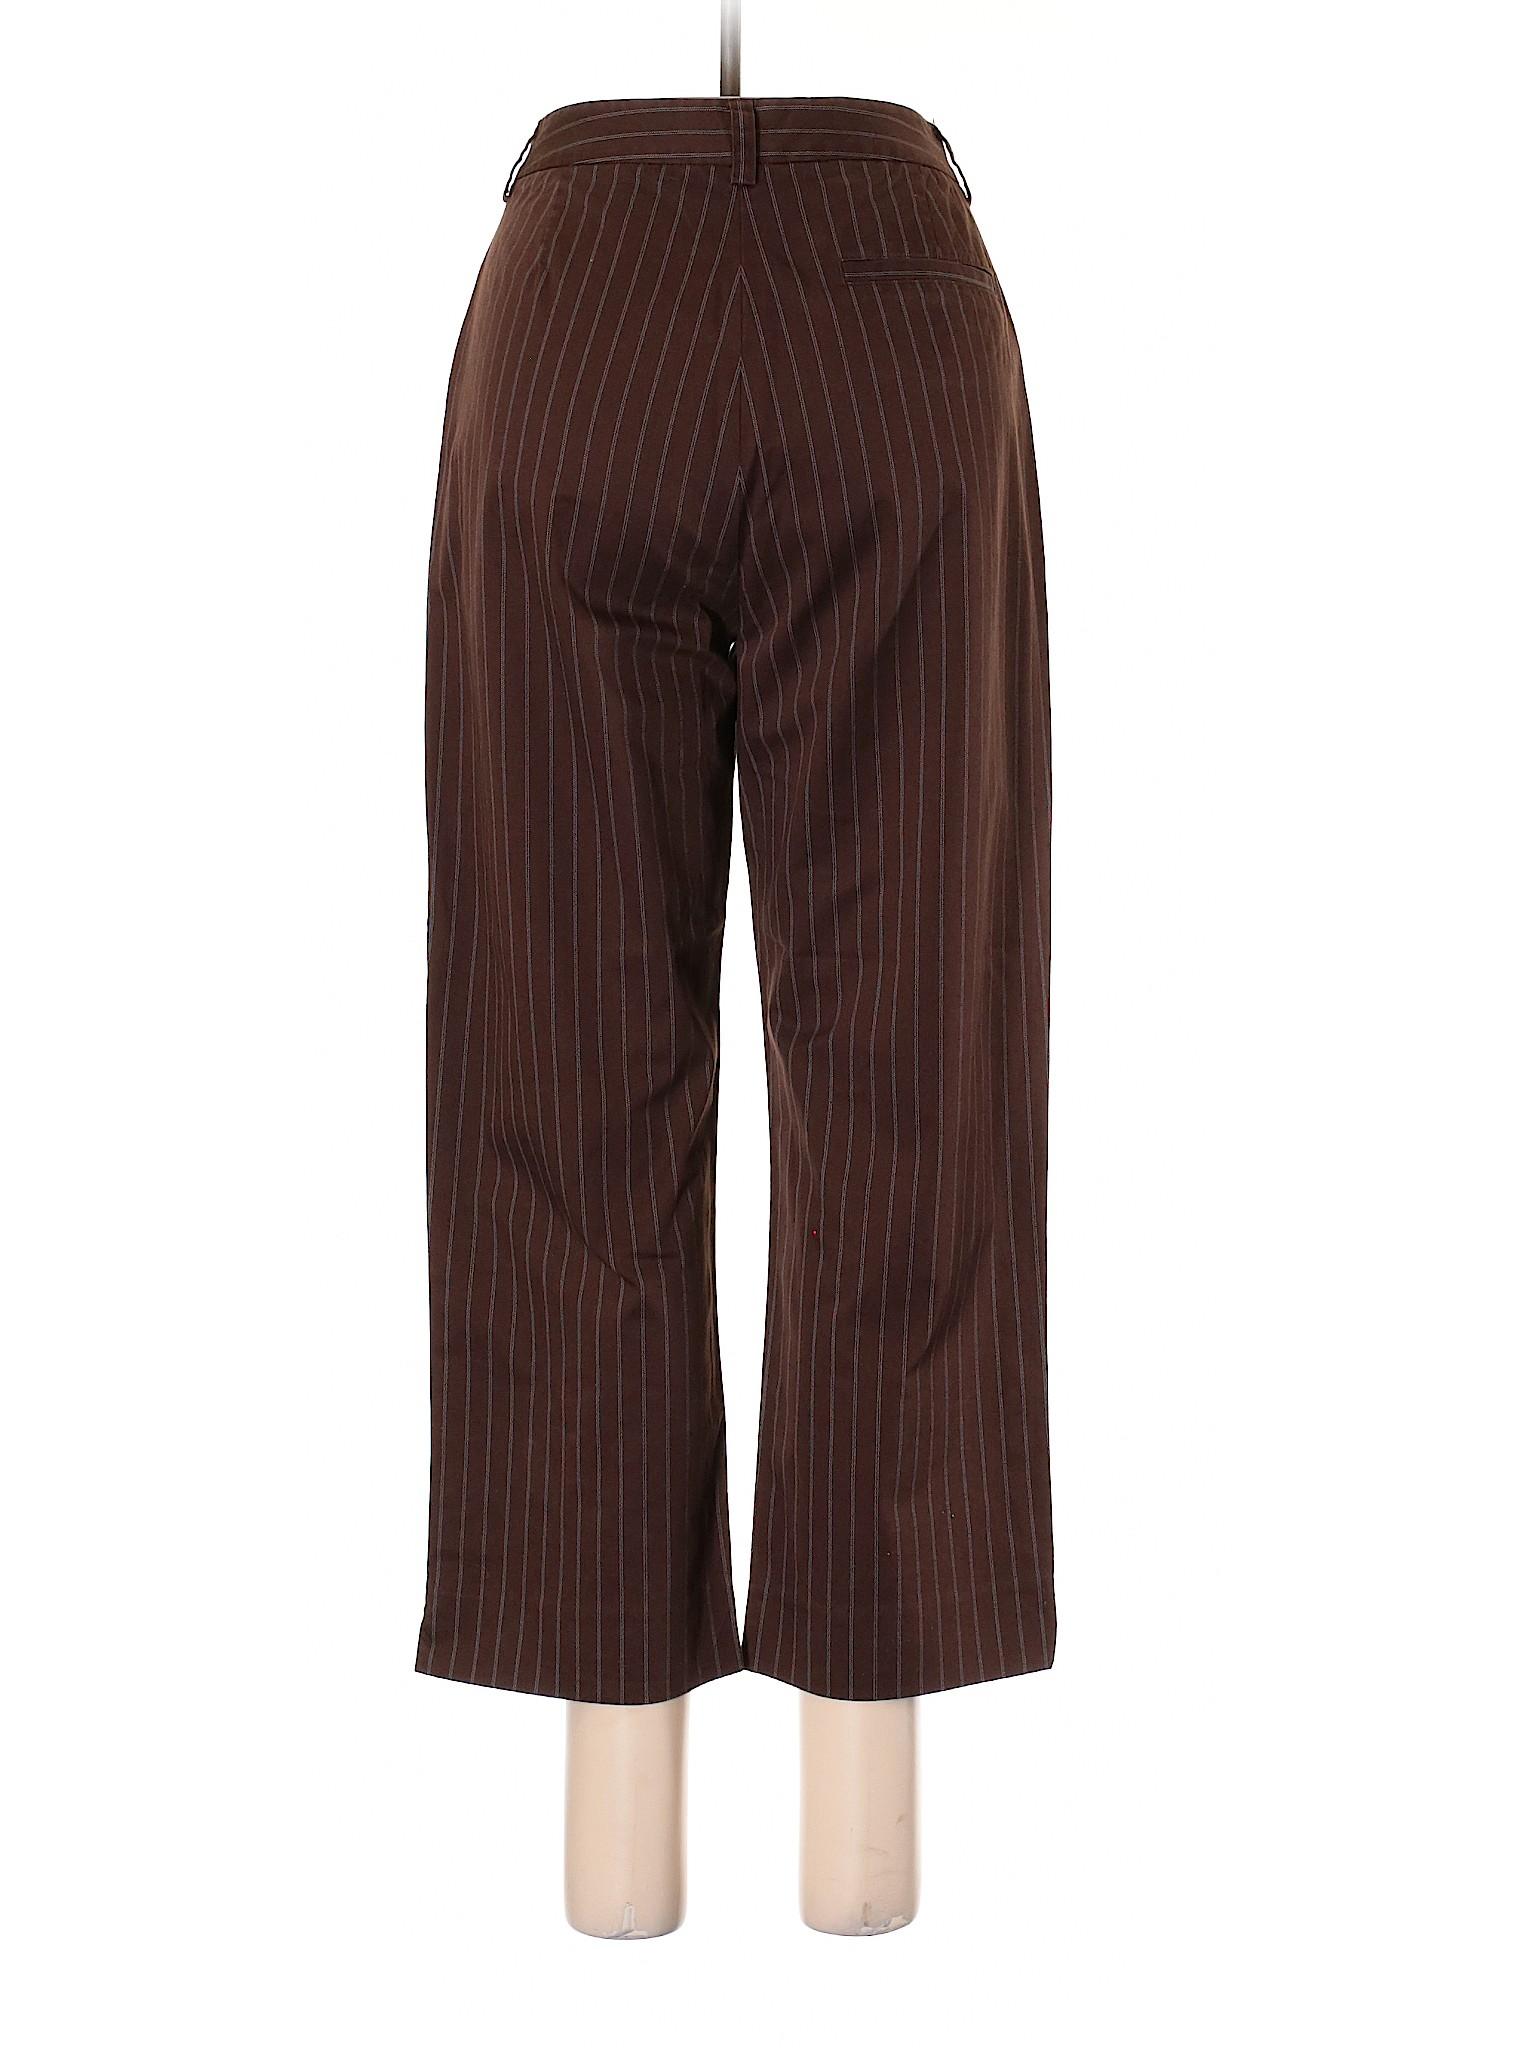 Signature leisure York Casual New Boutique Pants Jones 0RqwIxp